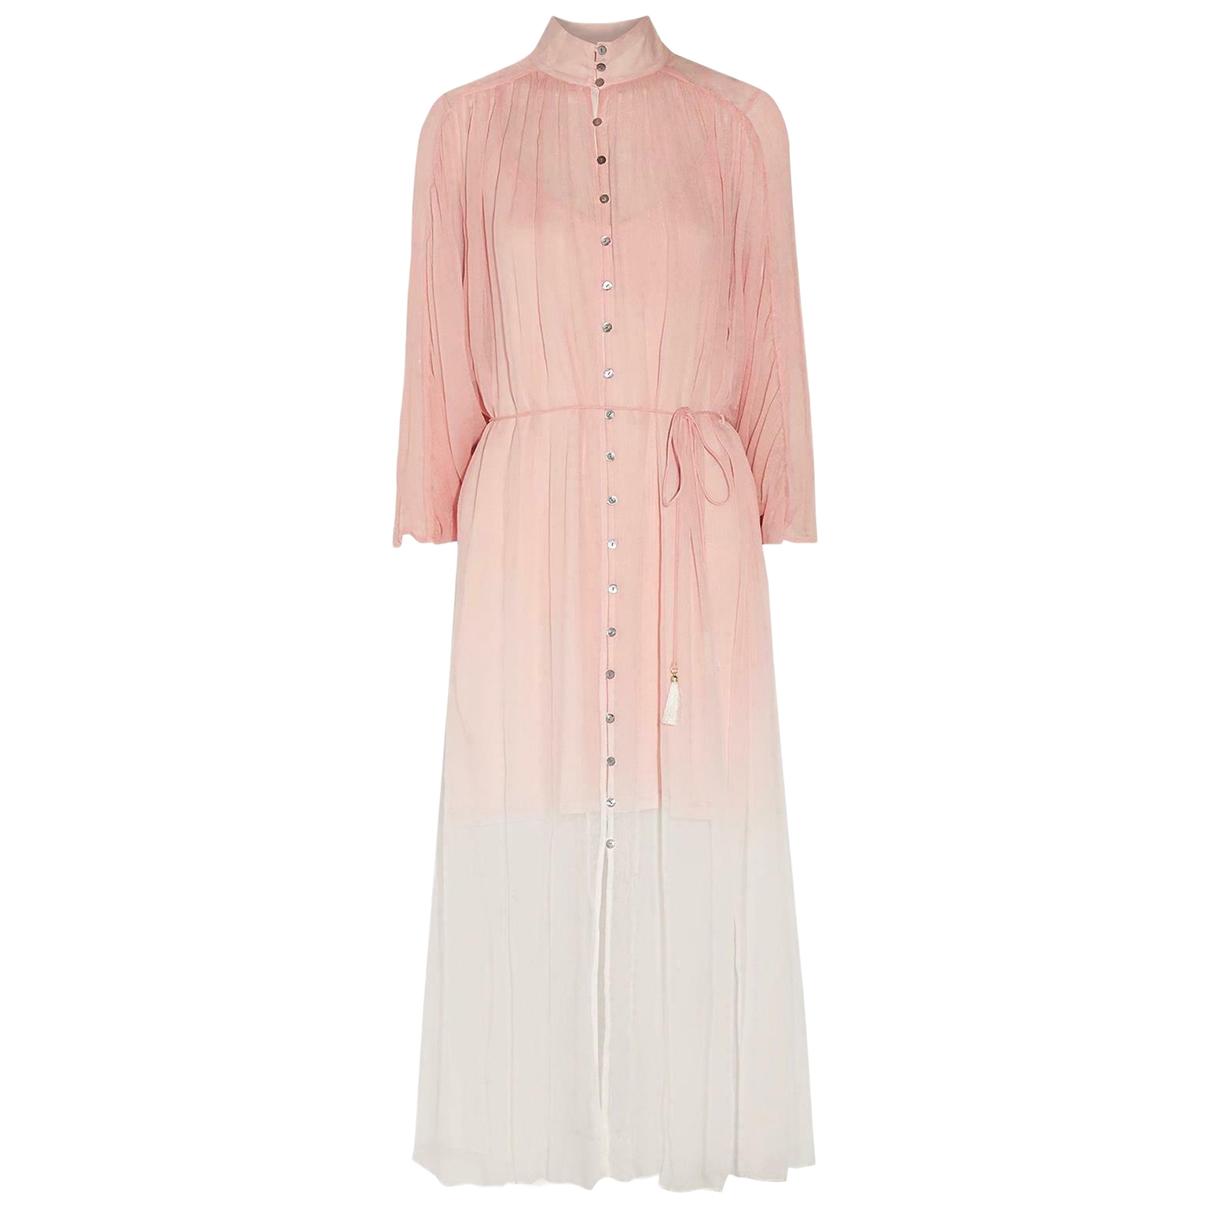 Zimmermann \N Pink Silk dress for Women 1 0-5